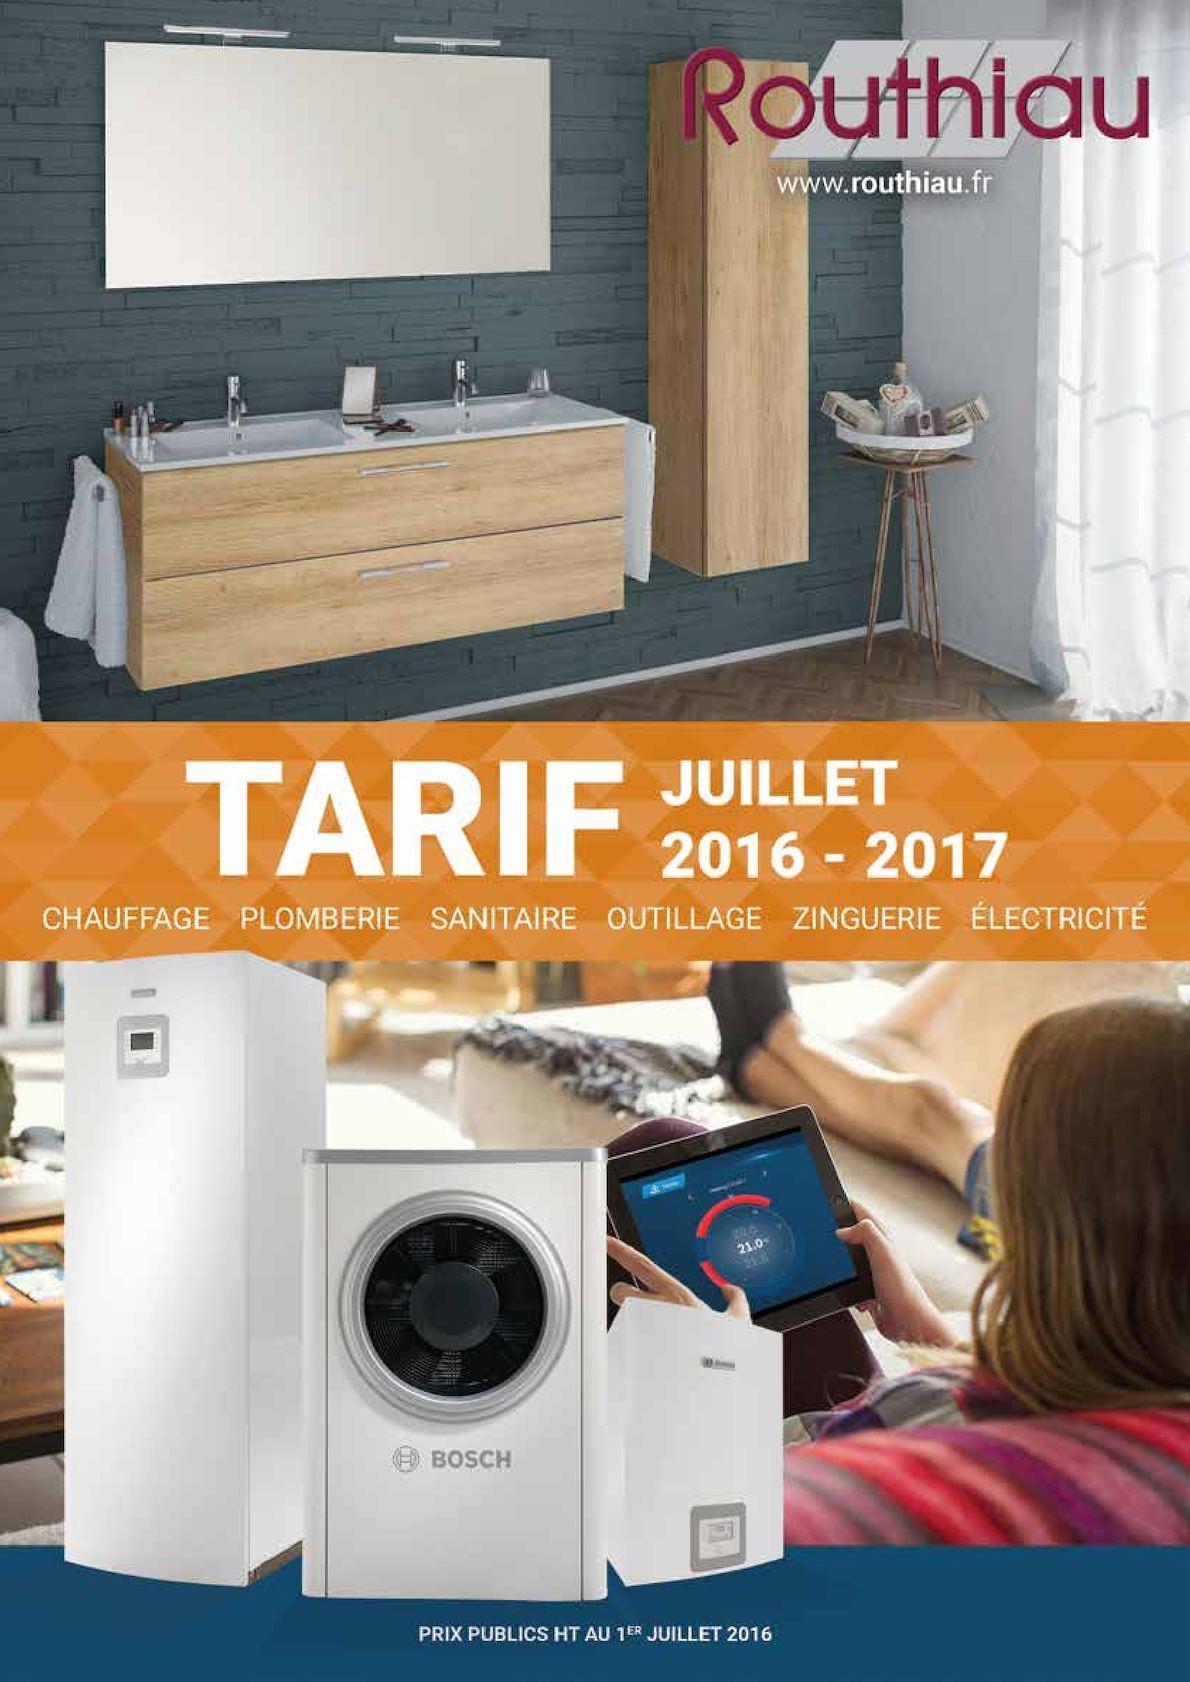 6da1b4de7cee Calaméo - Tarif Routhiau 2016